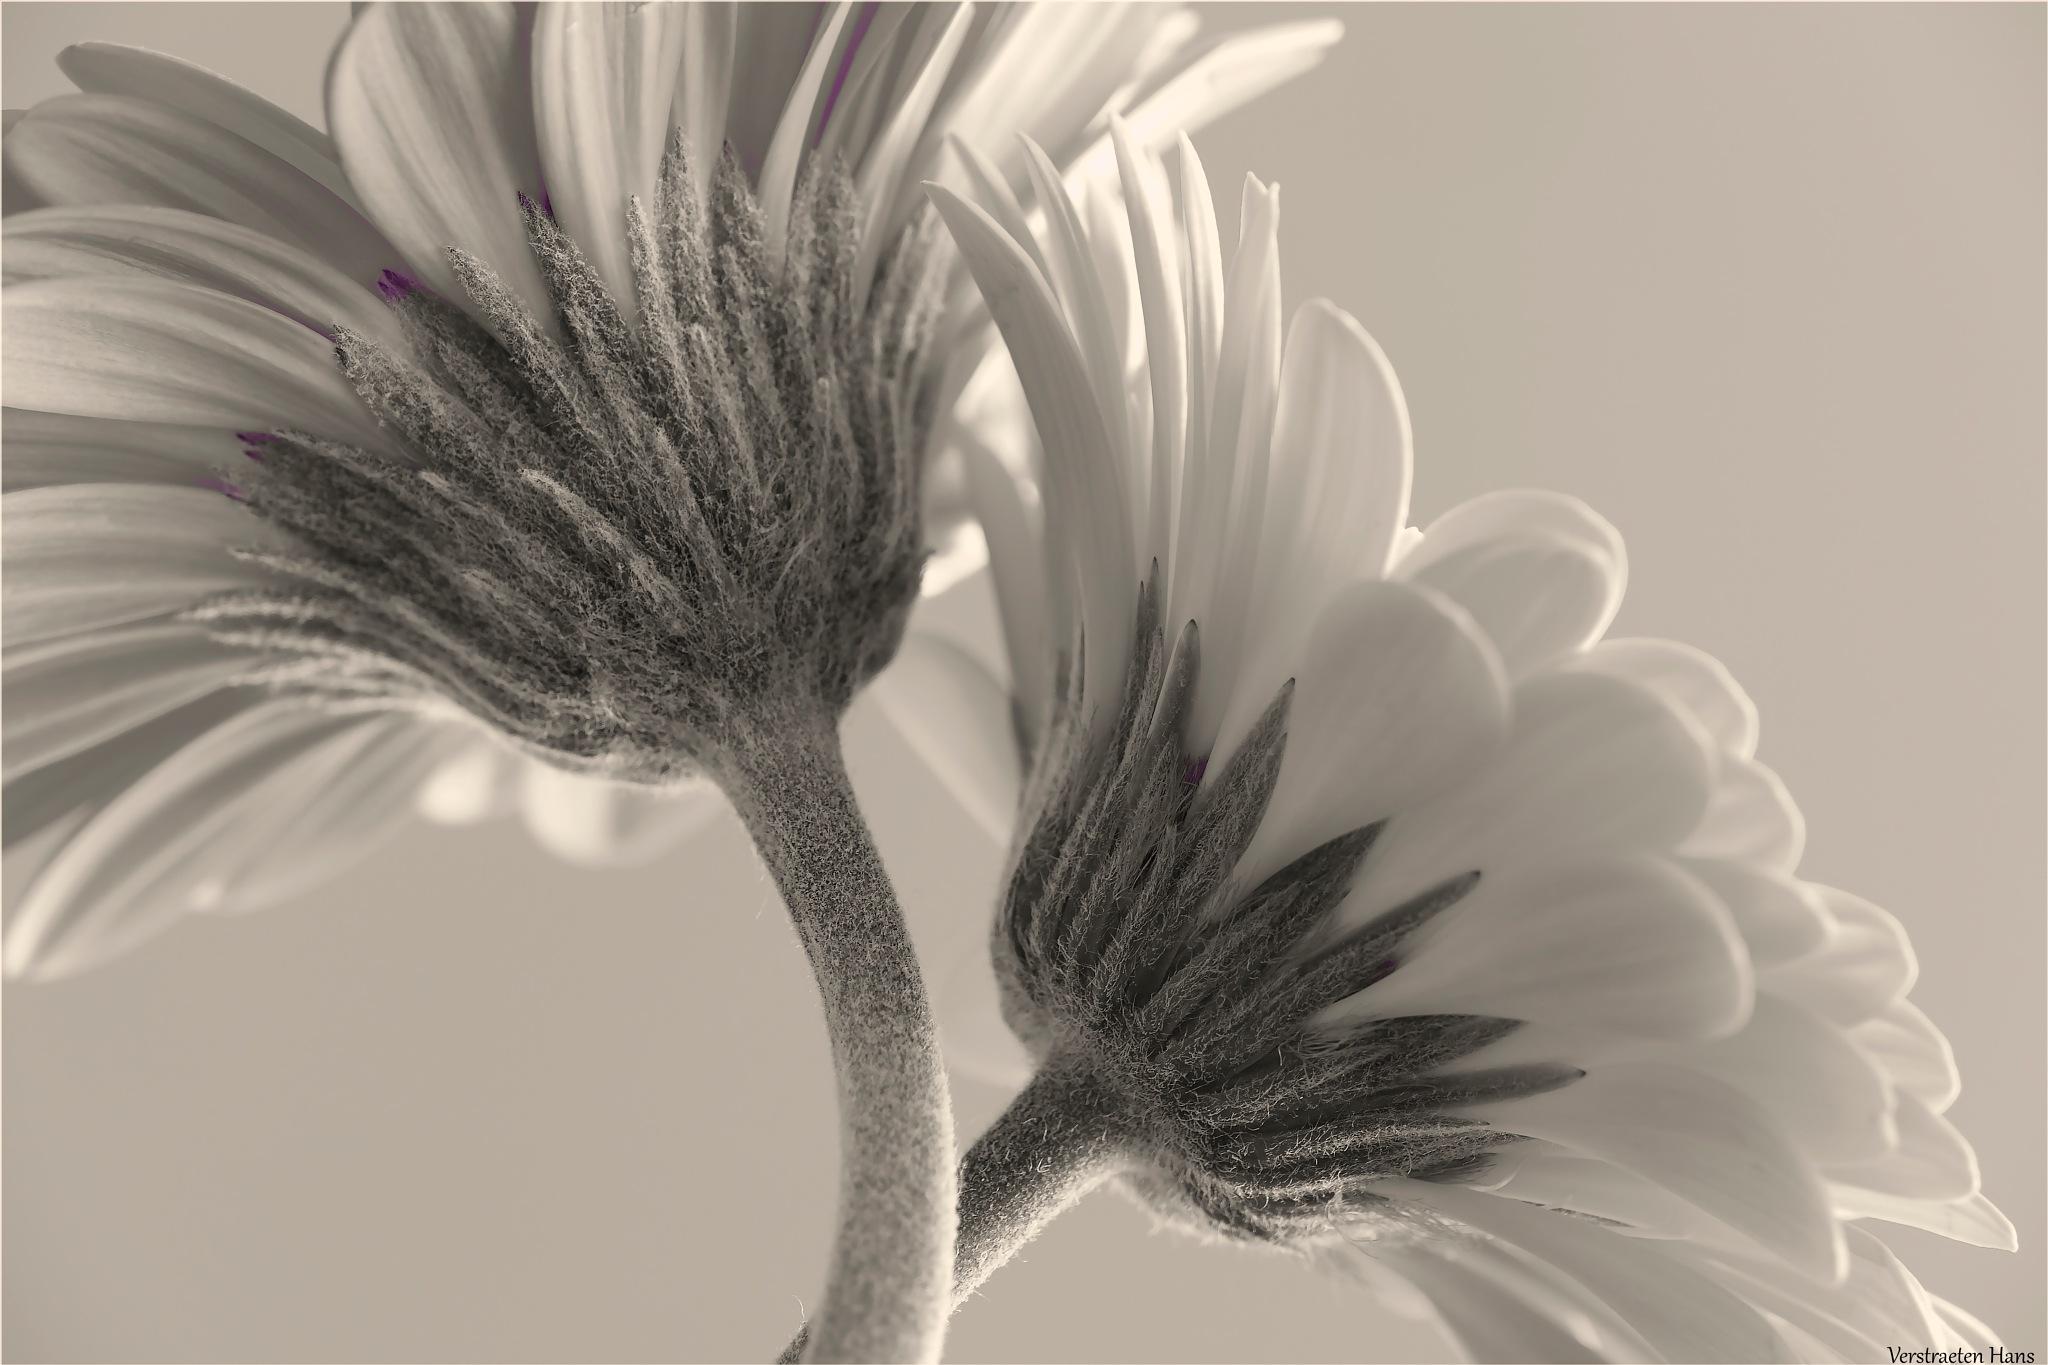 Bright white by zard319